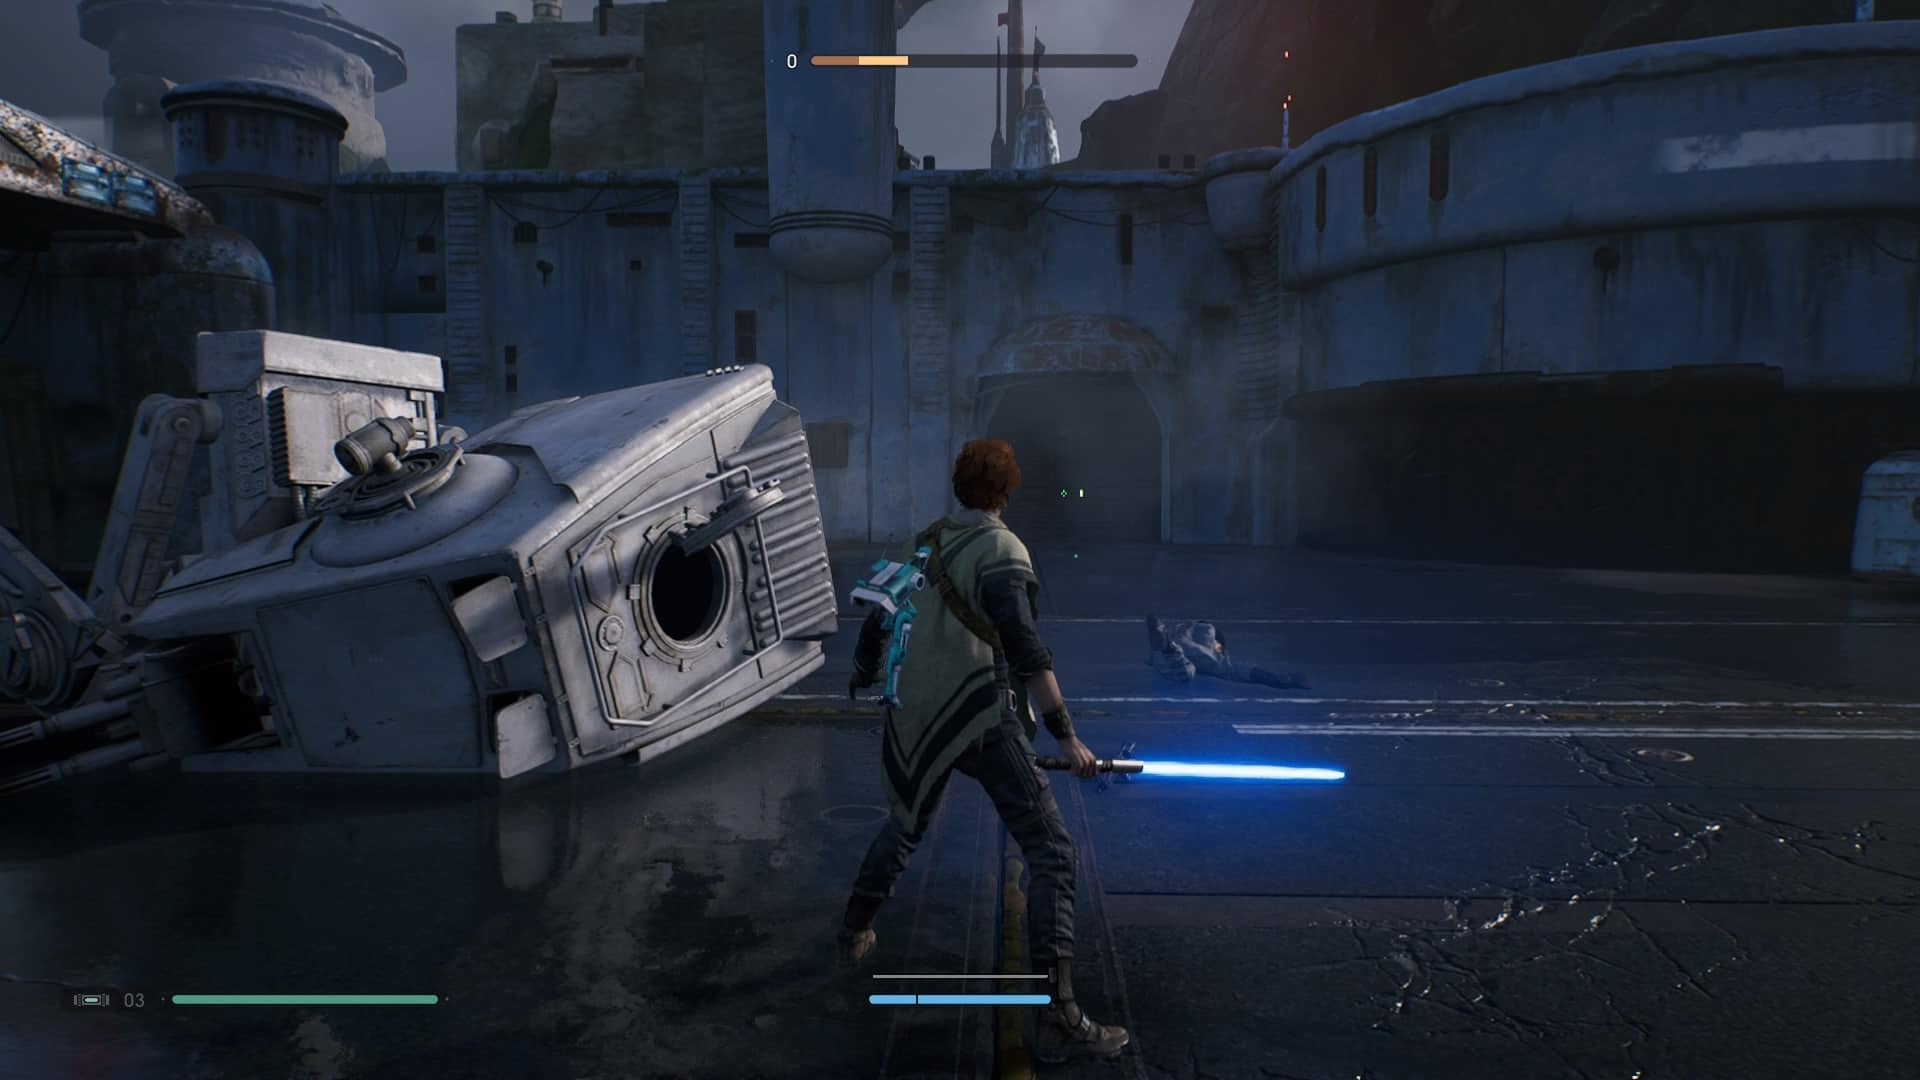 [Análise] Star Wars JEDI: Fallen Order: Vale a Pena? 4